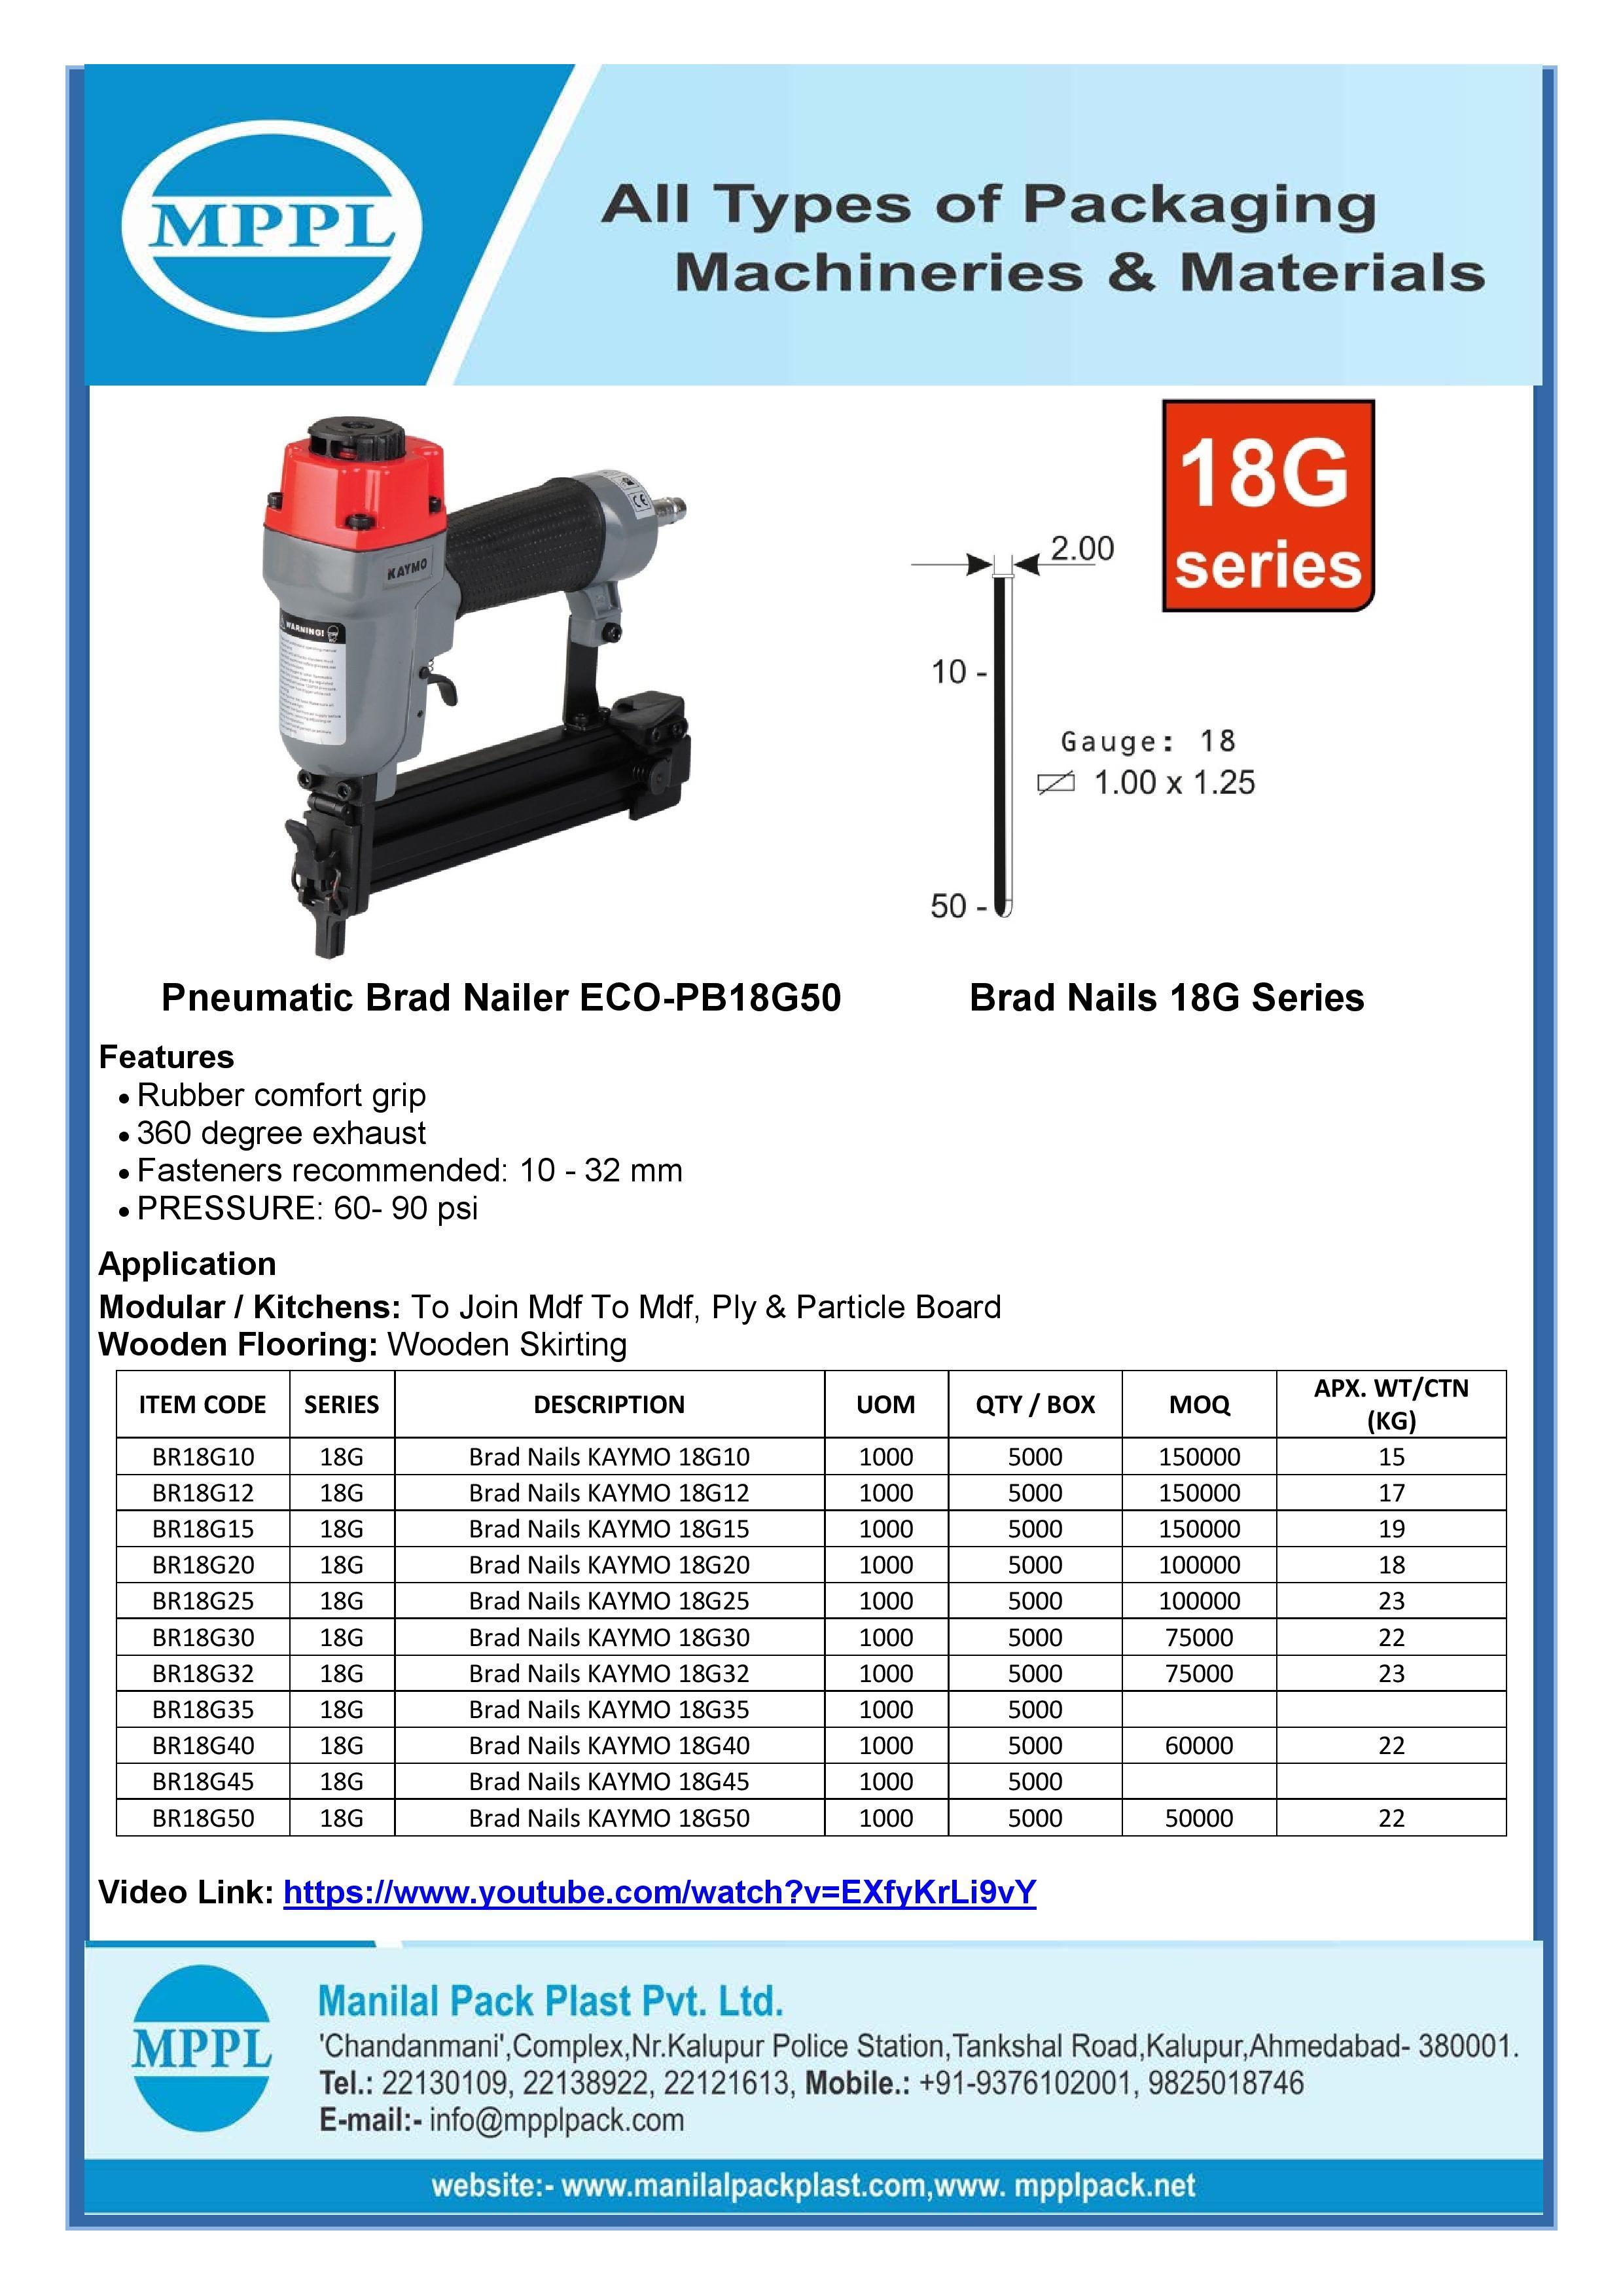 Pneumatic Brad Nailer ECO-PB18G50